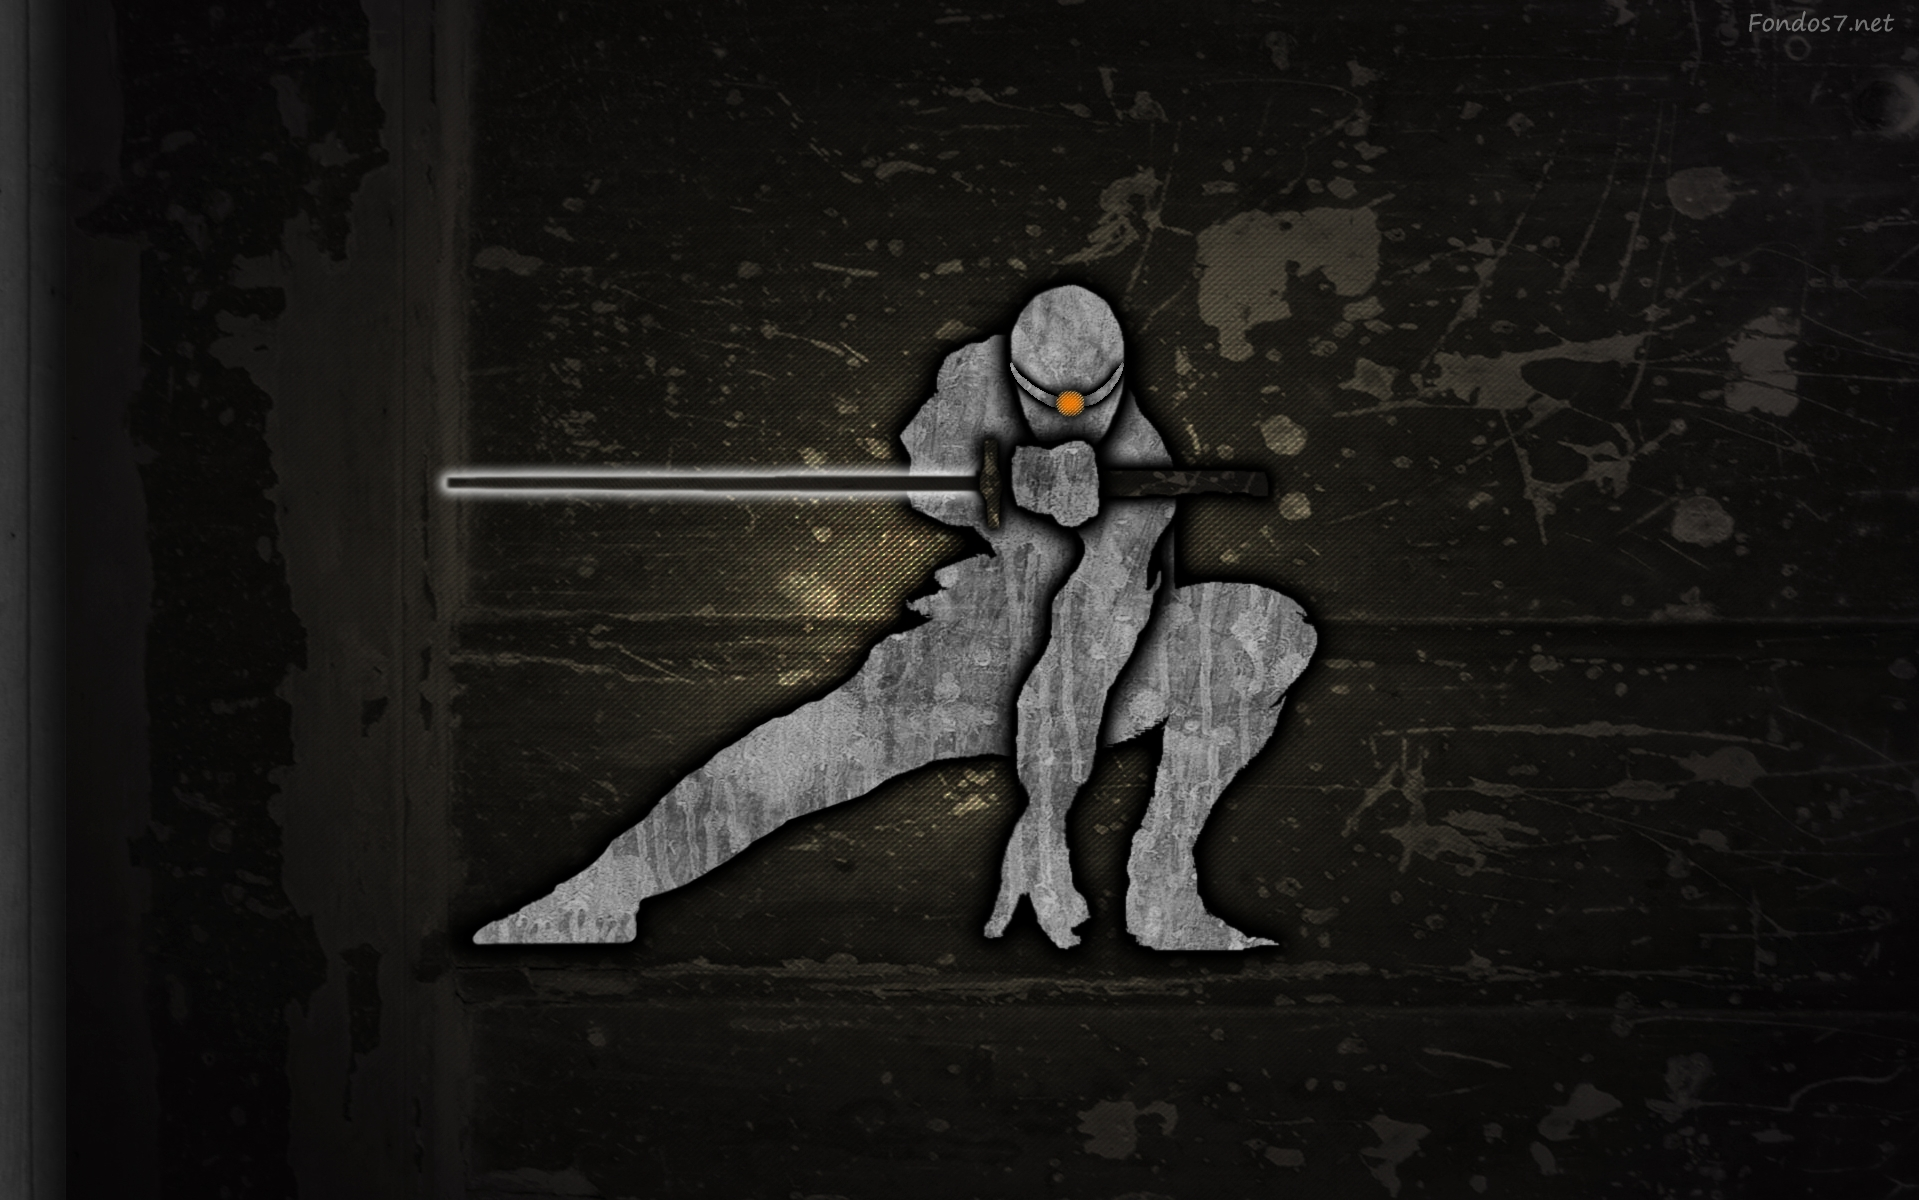 Ninja Wallpaper Free Hd Wallpapers